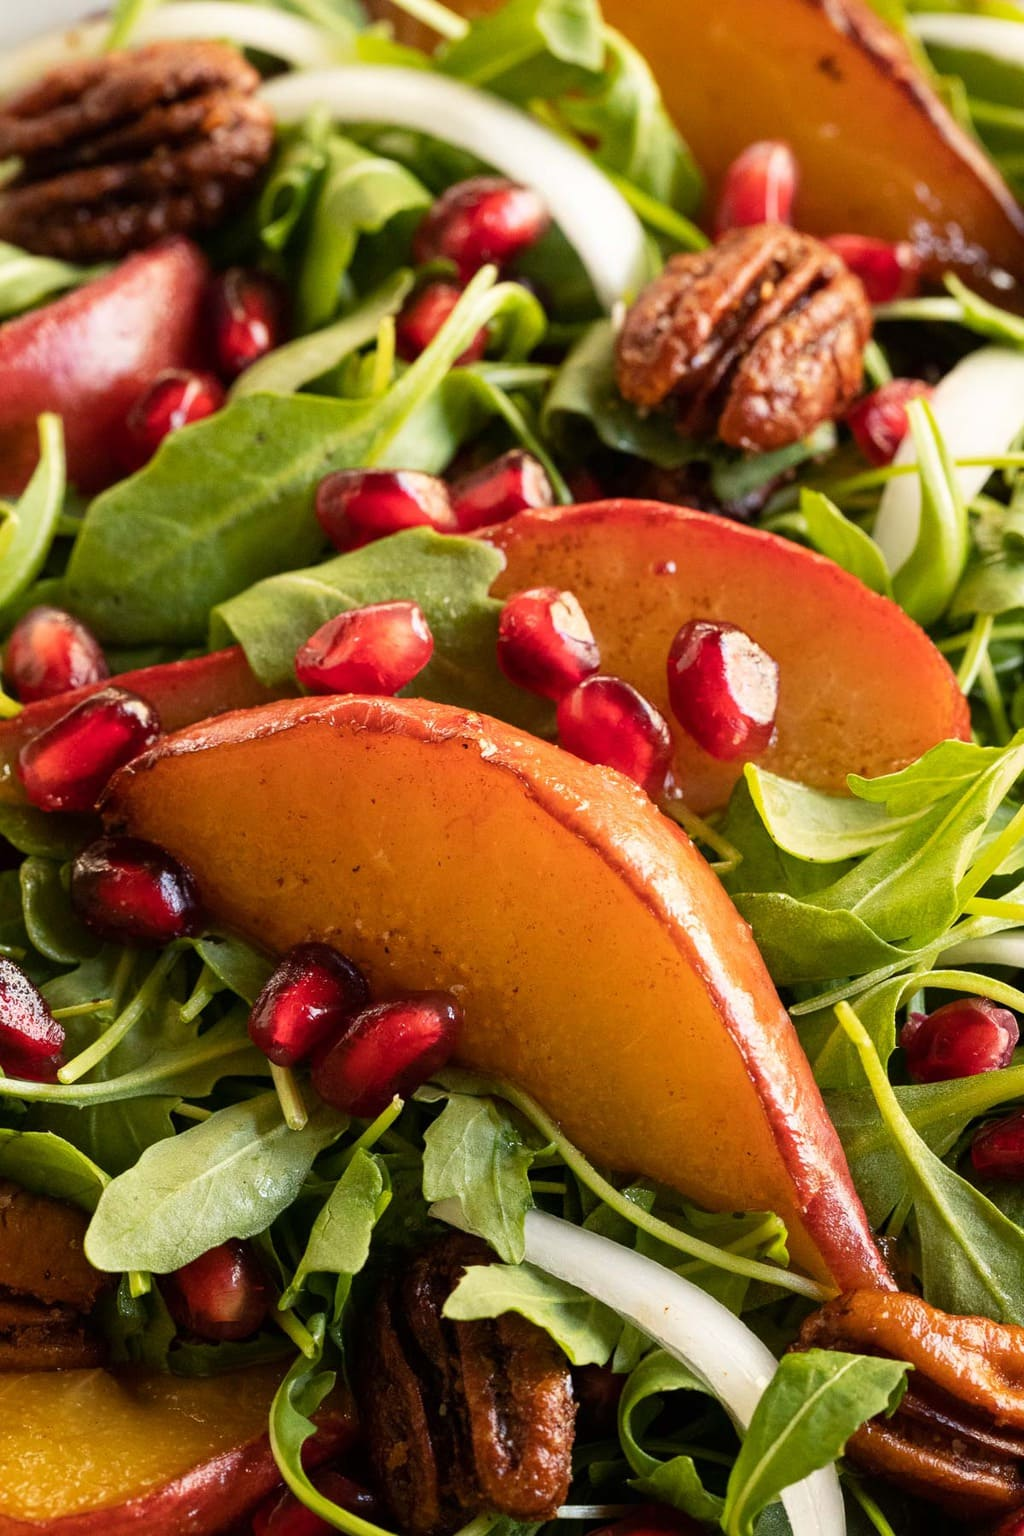 Extreme closeup photo of a Caramelized Pear Arugula Salad featuring pomegranate arils and caramelized pears.